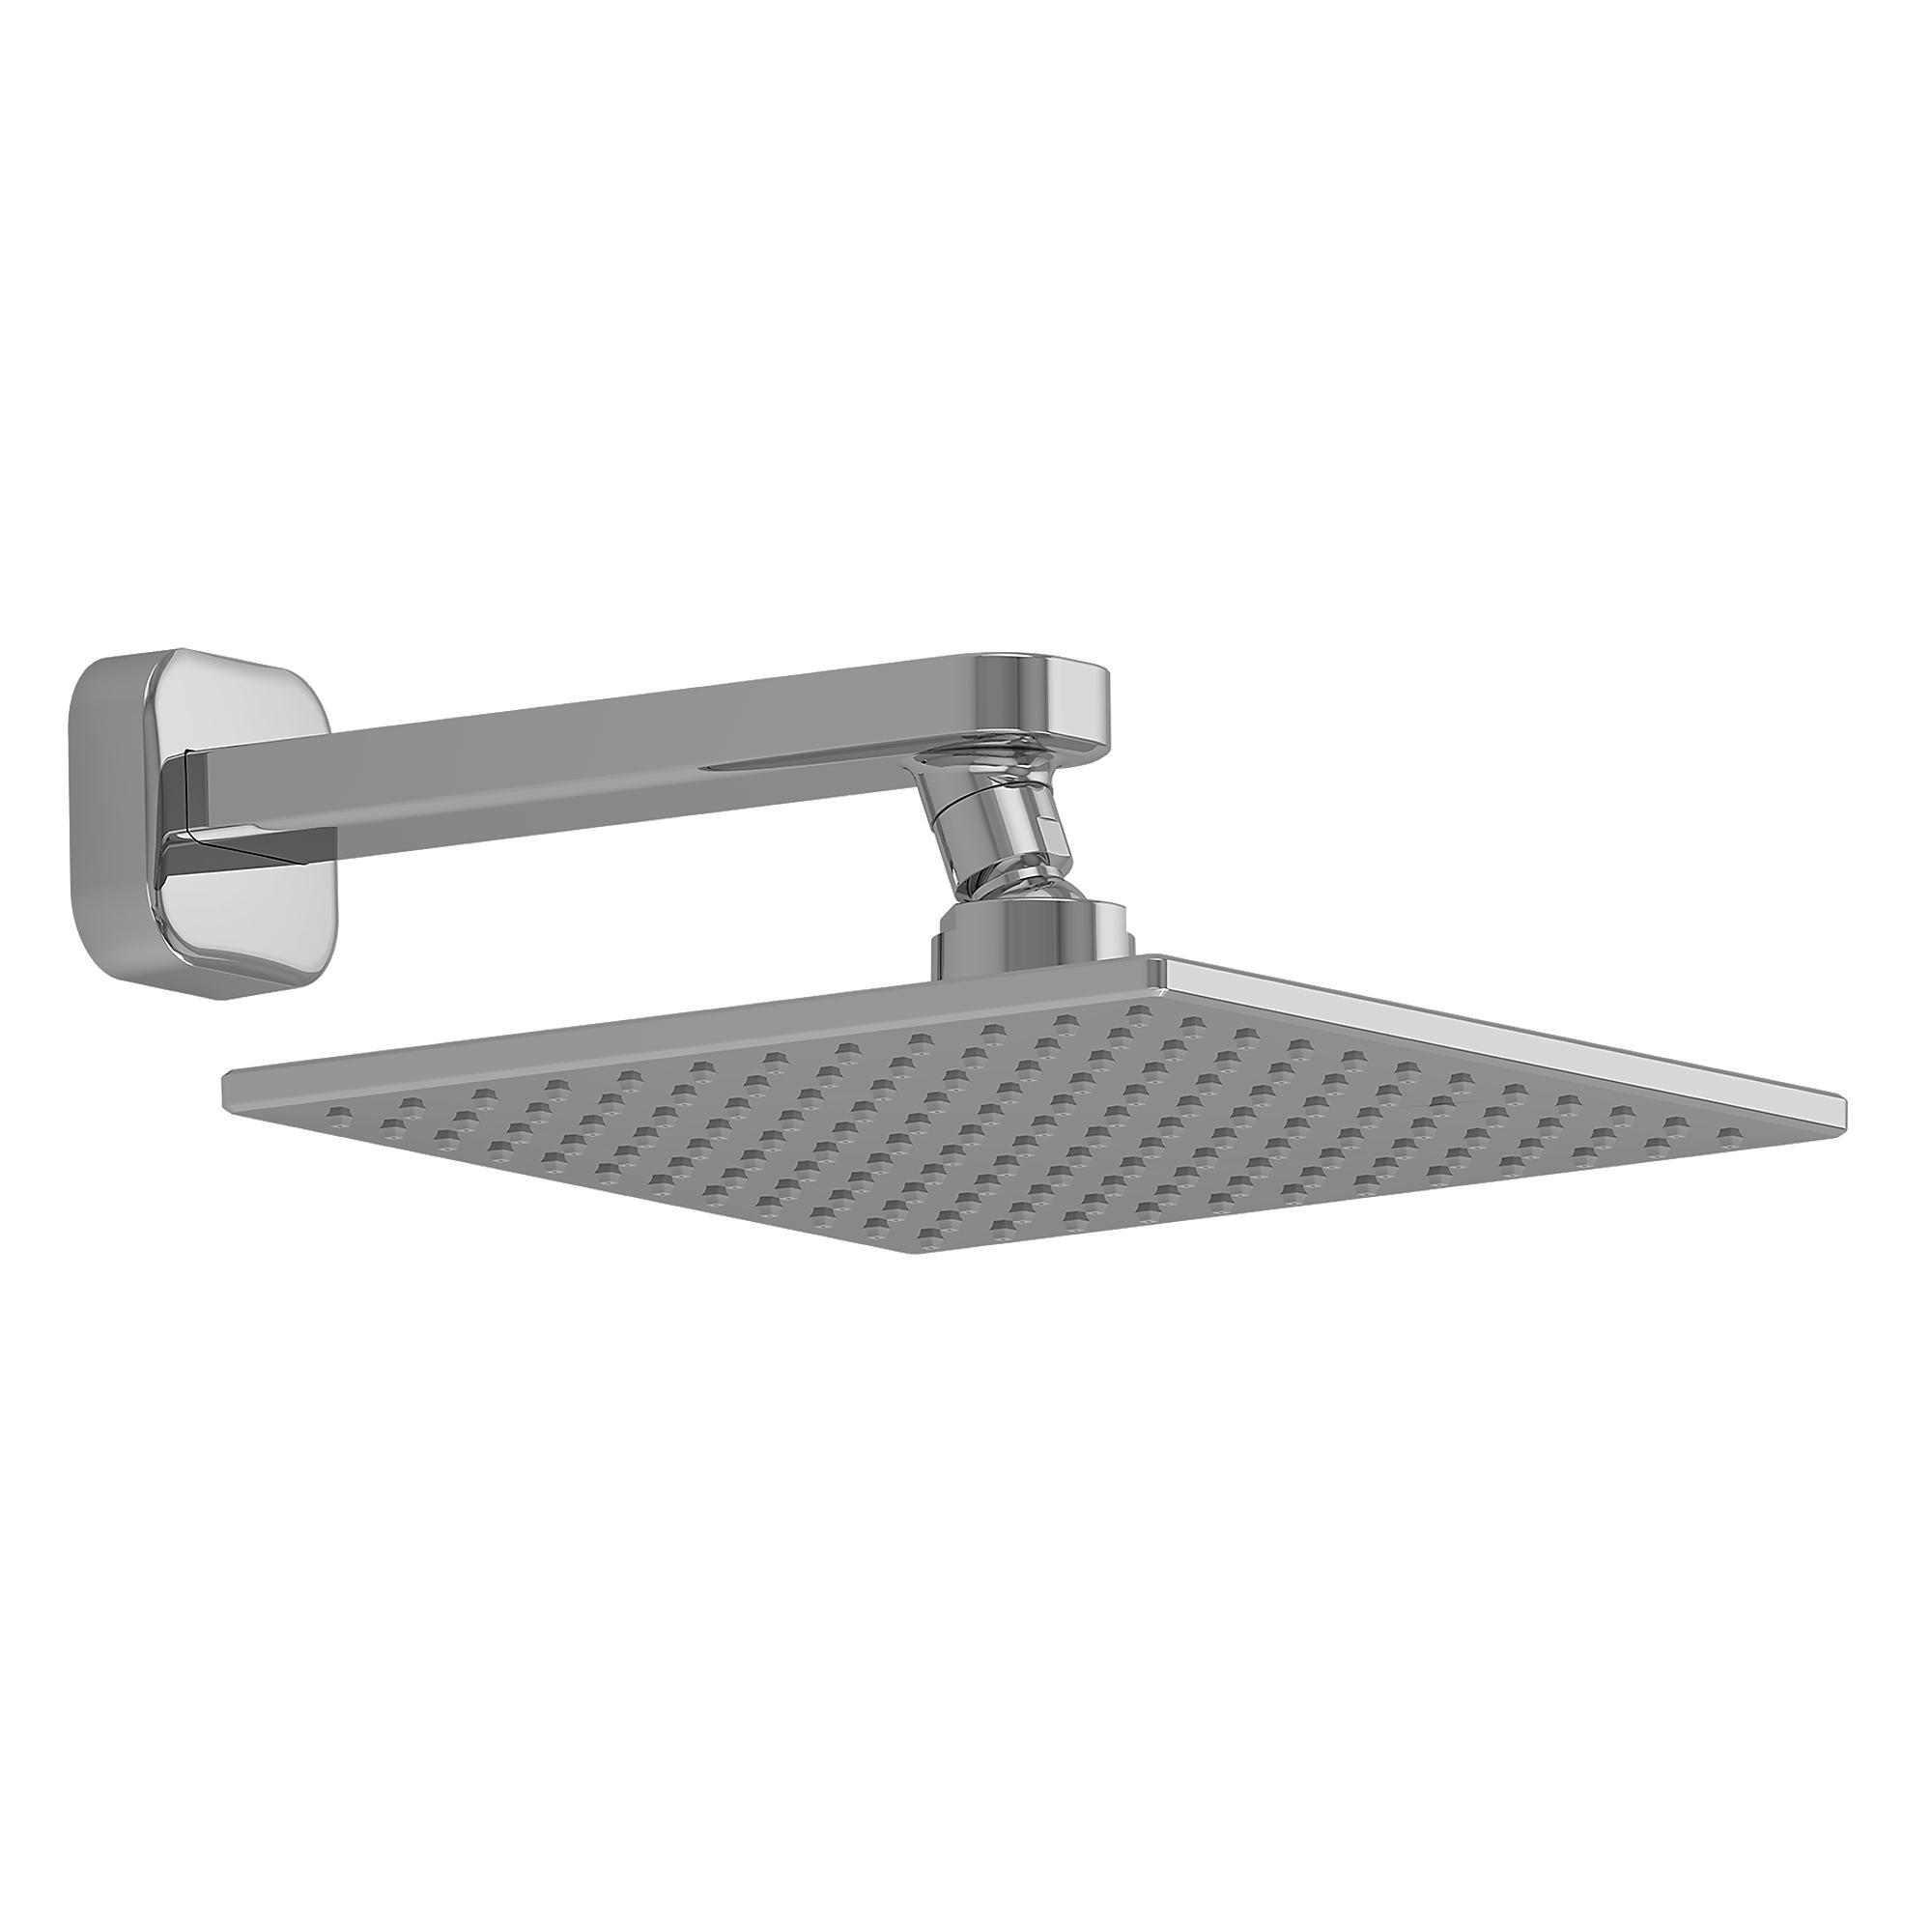 Ts630ar cp upton  showerhead 0